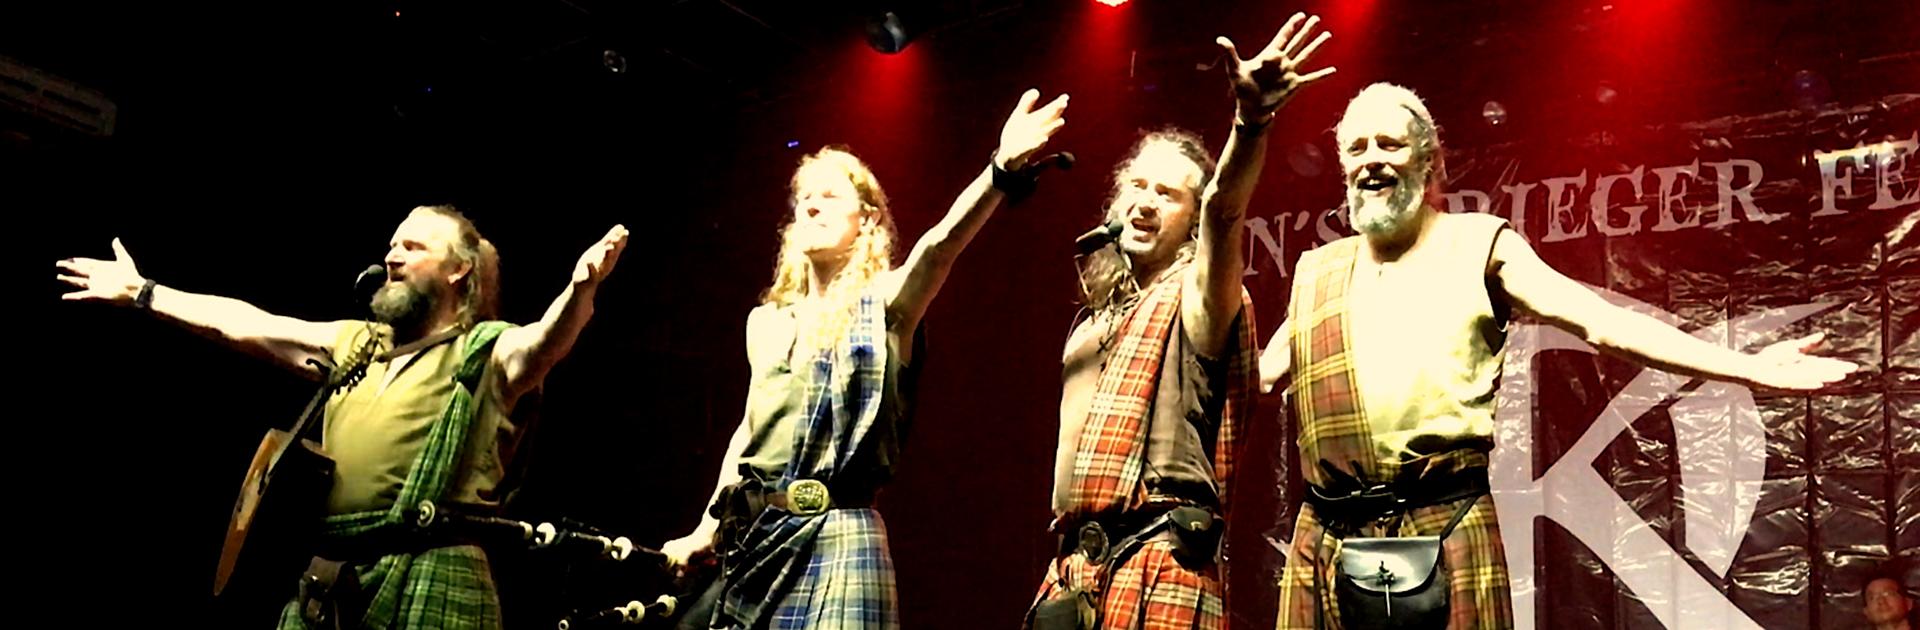 Odin's-Krieger-Fest-São-Paulo-Brazil-The-Encore-Rapalje-Celtic-Folk-Music